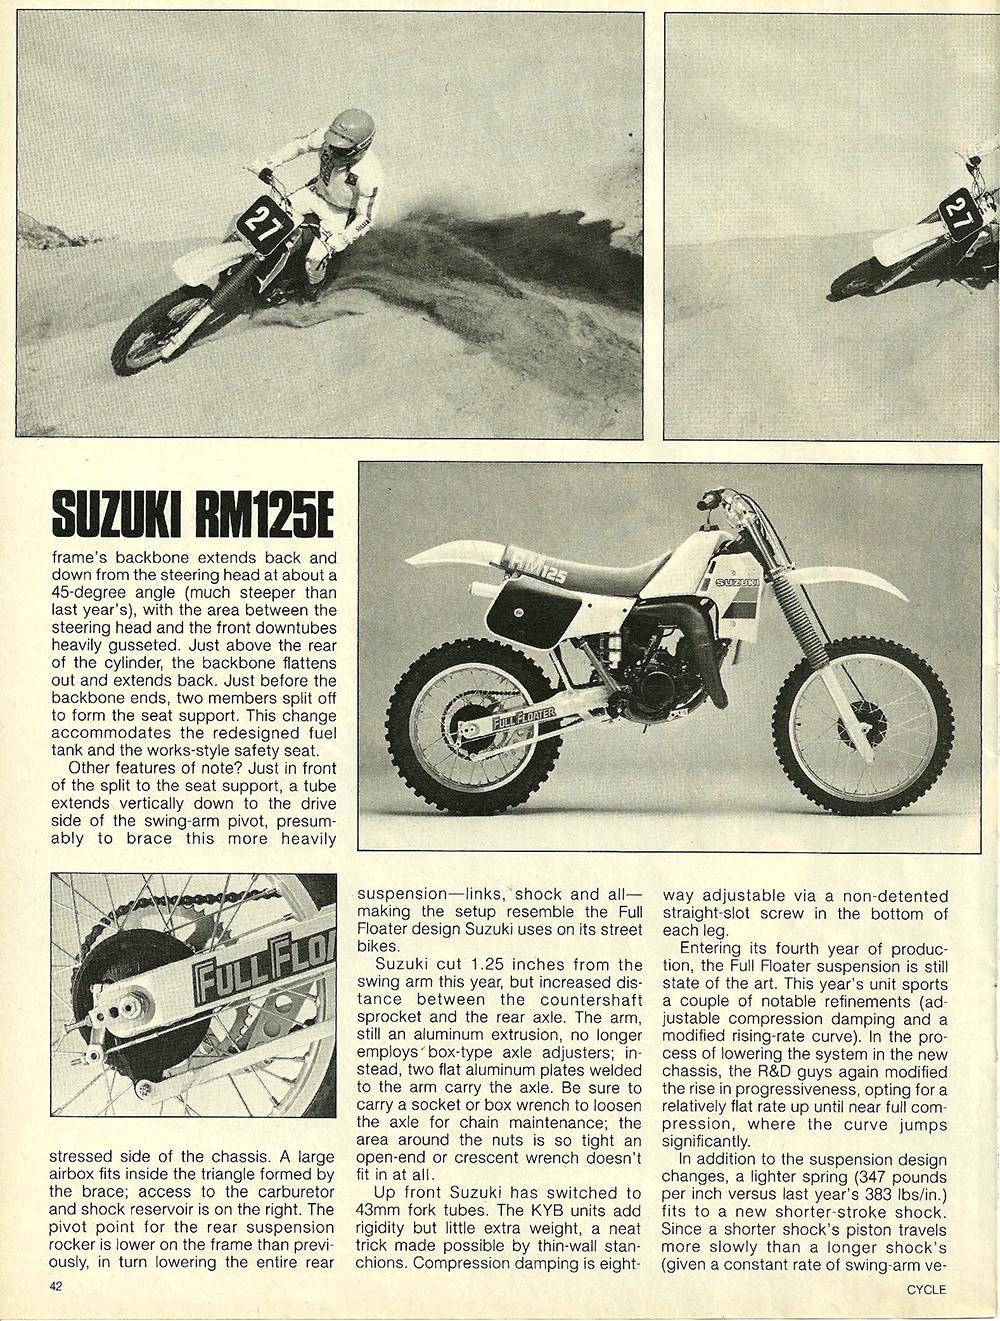 1984 Suzuki RM125E road test 3.jpg